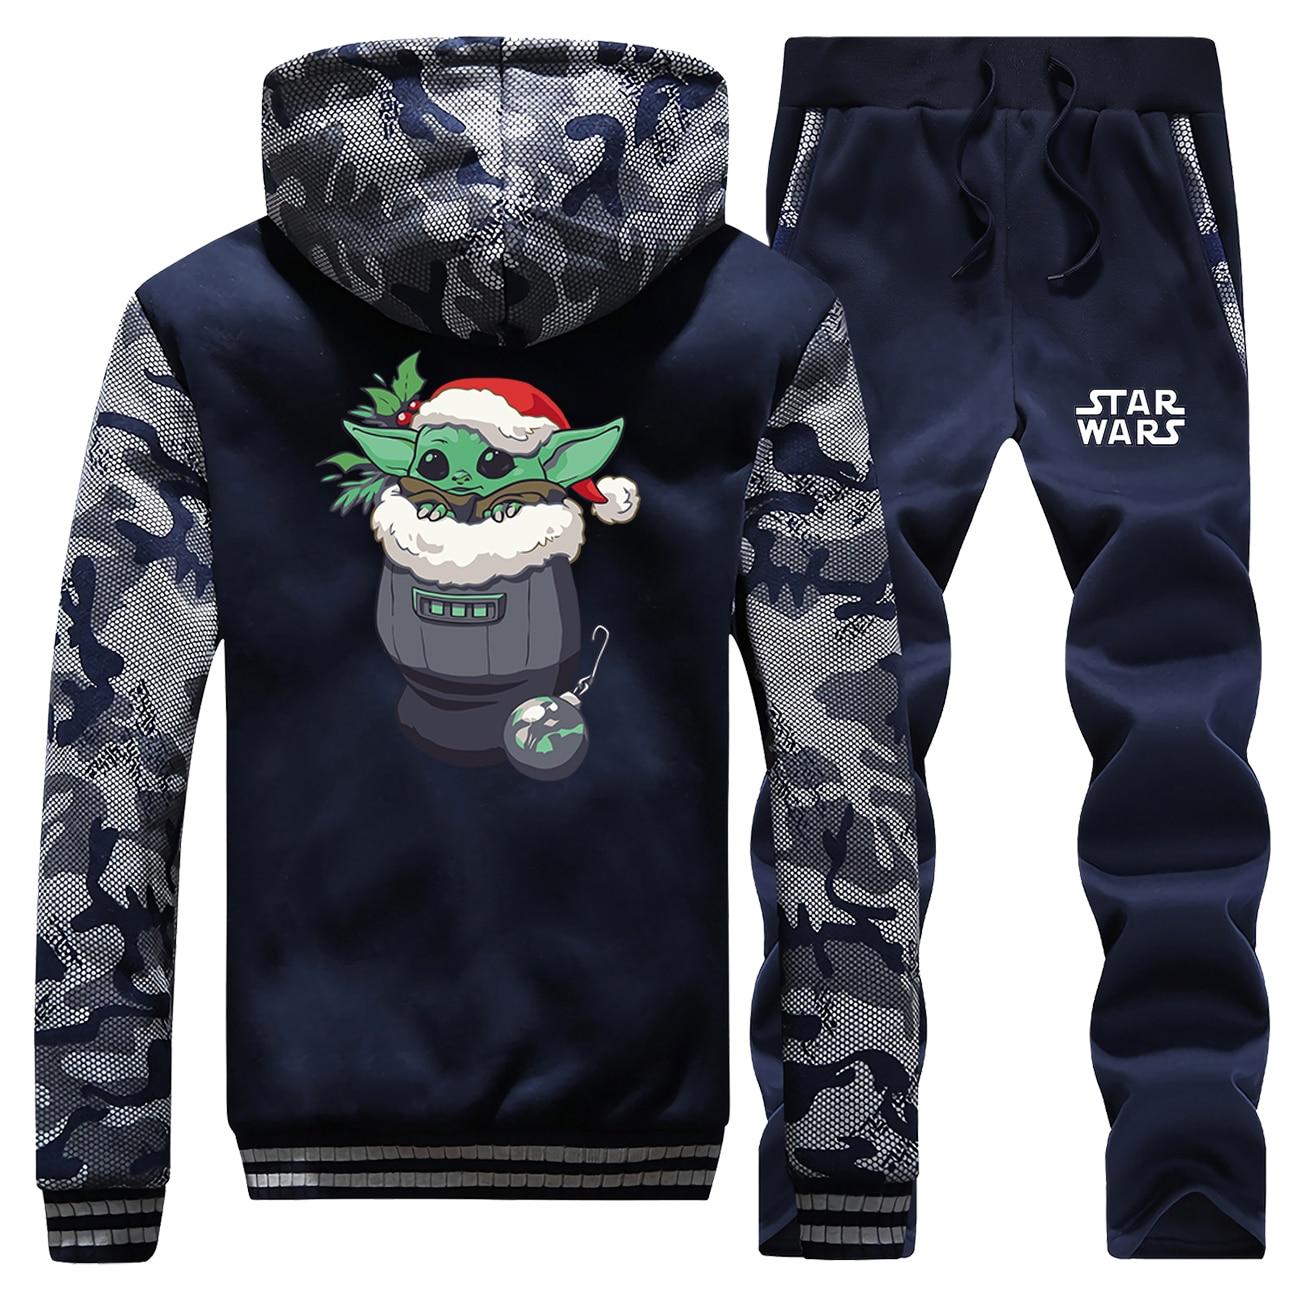 Men Thick Winter 2 Pieces Sets Baby Yoda Fleece Warm Jacket Coat Mandalorian Coats Hoodies Sweatshirts Mens Star Wars Jackets